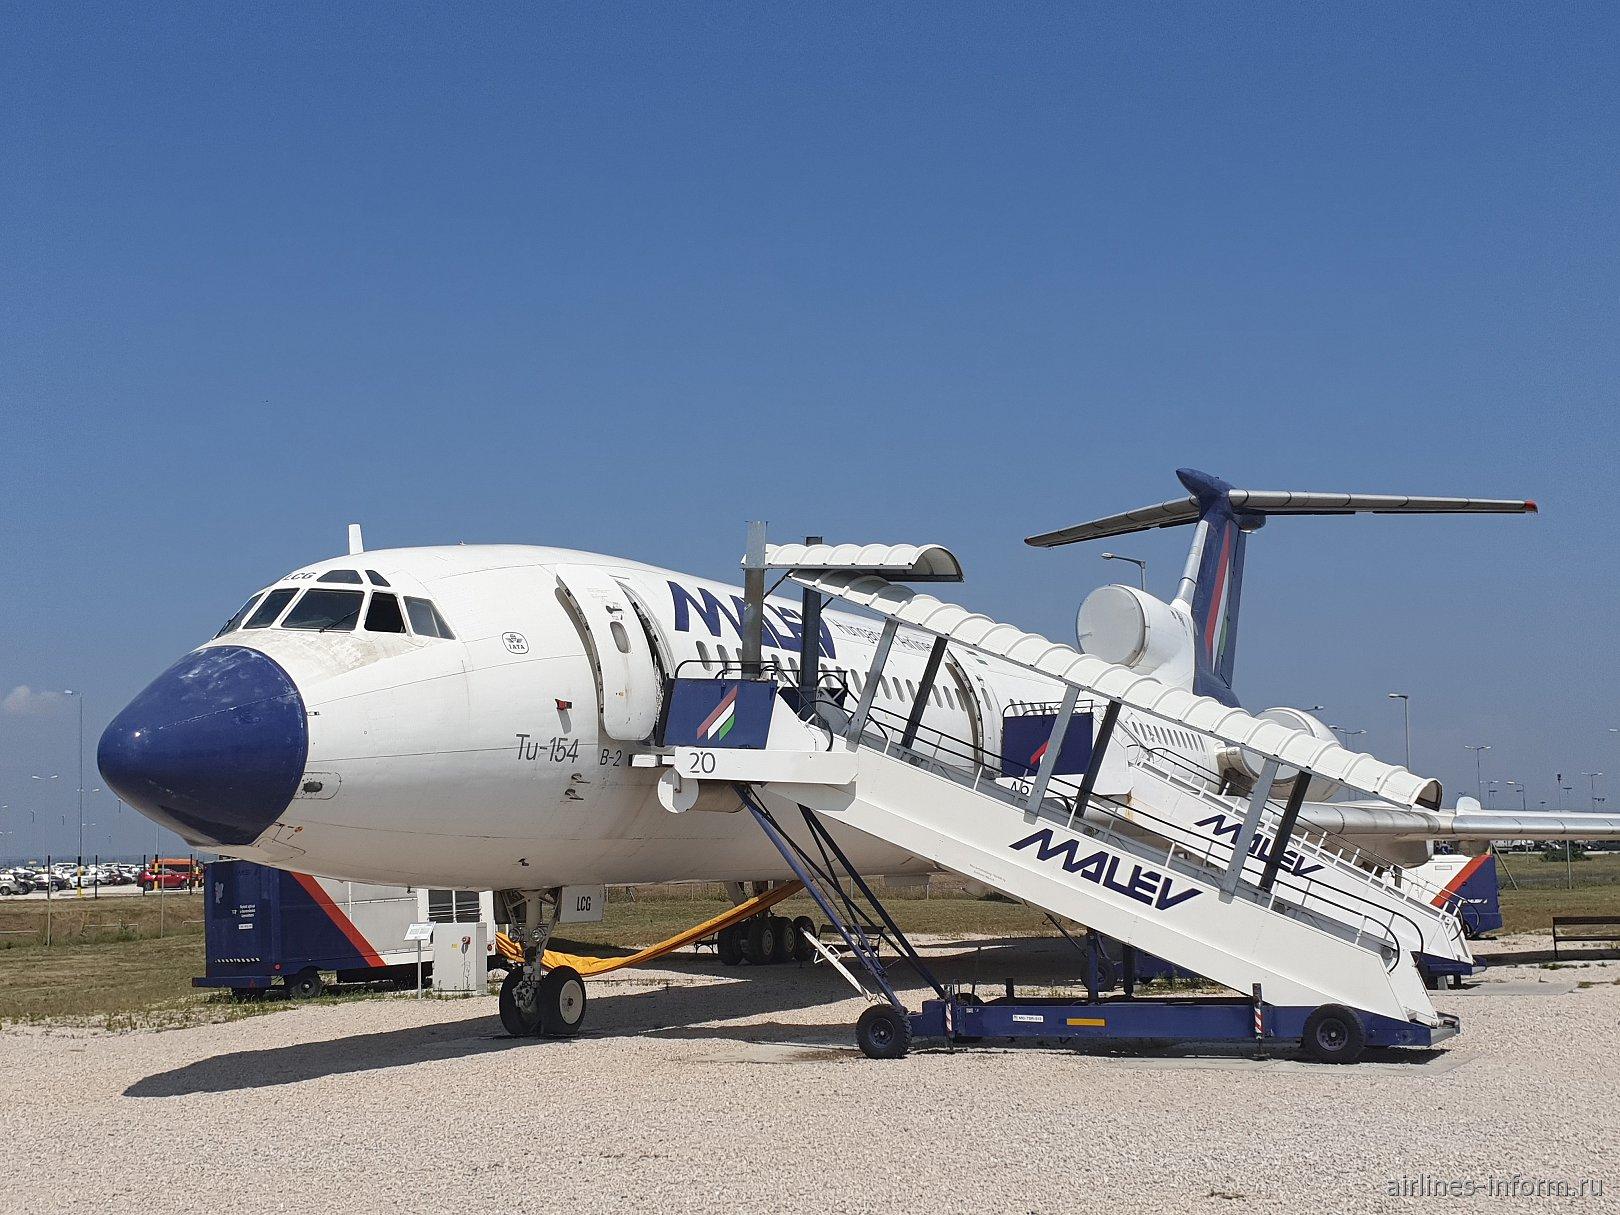 Самолет Ту-154Б-2 HA-LCG авиакомпании Malev в музее аэропорта Будапешт